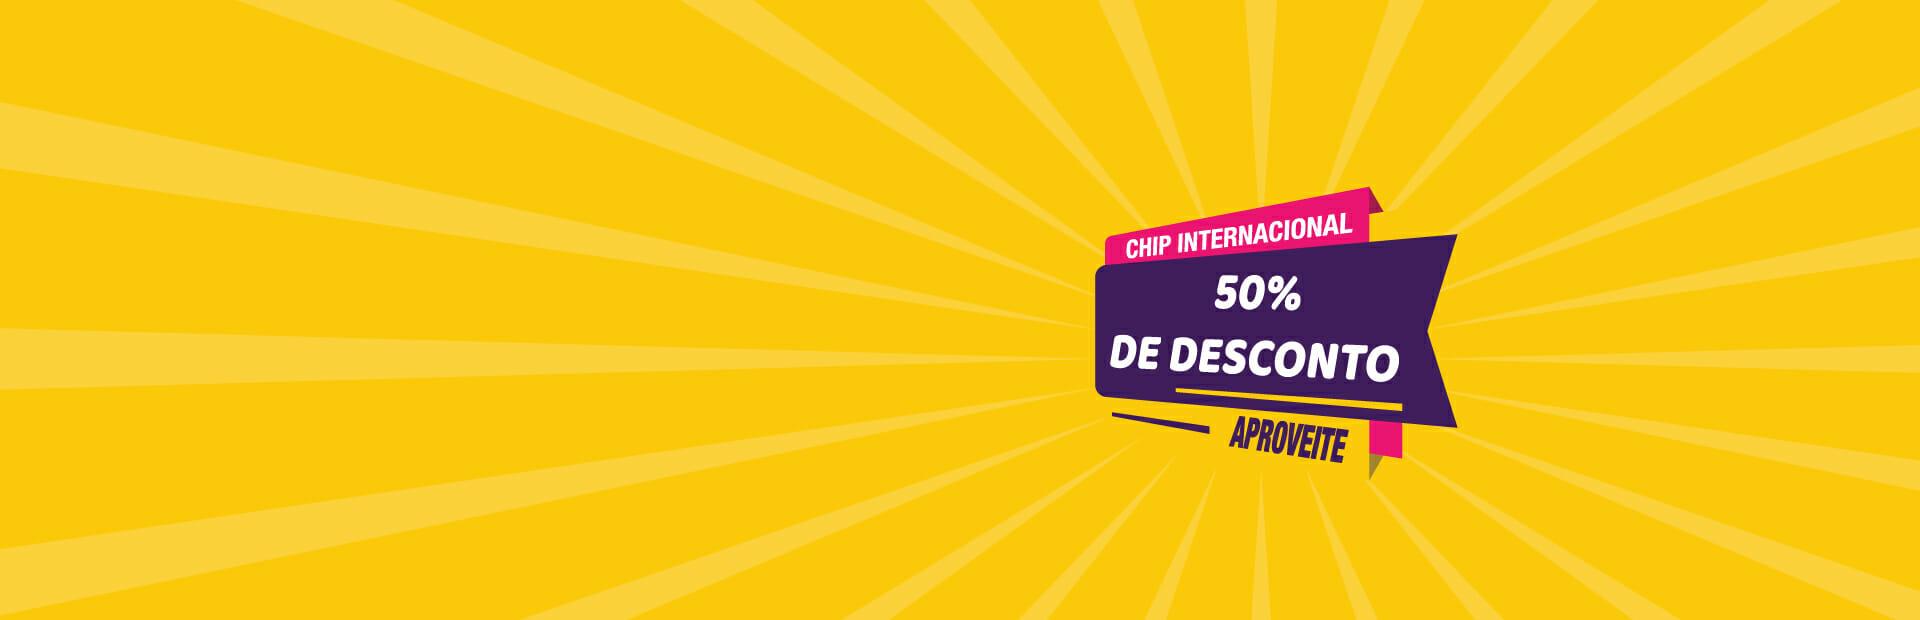 chip estados unidos promo